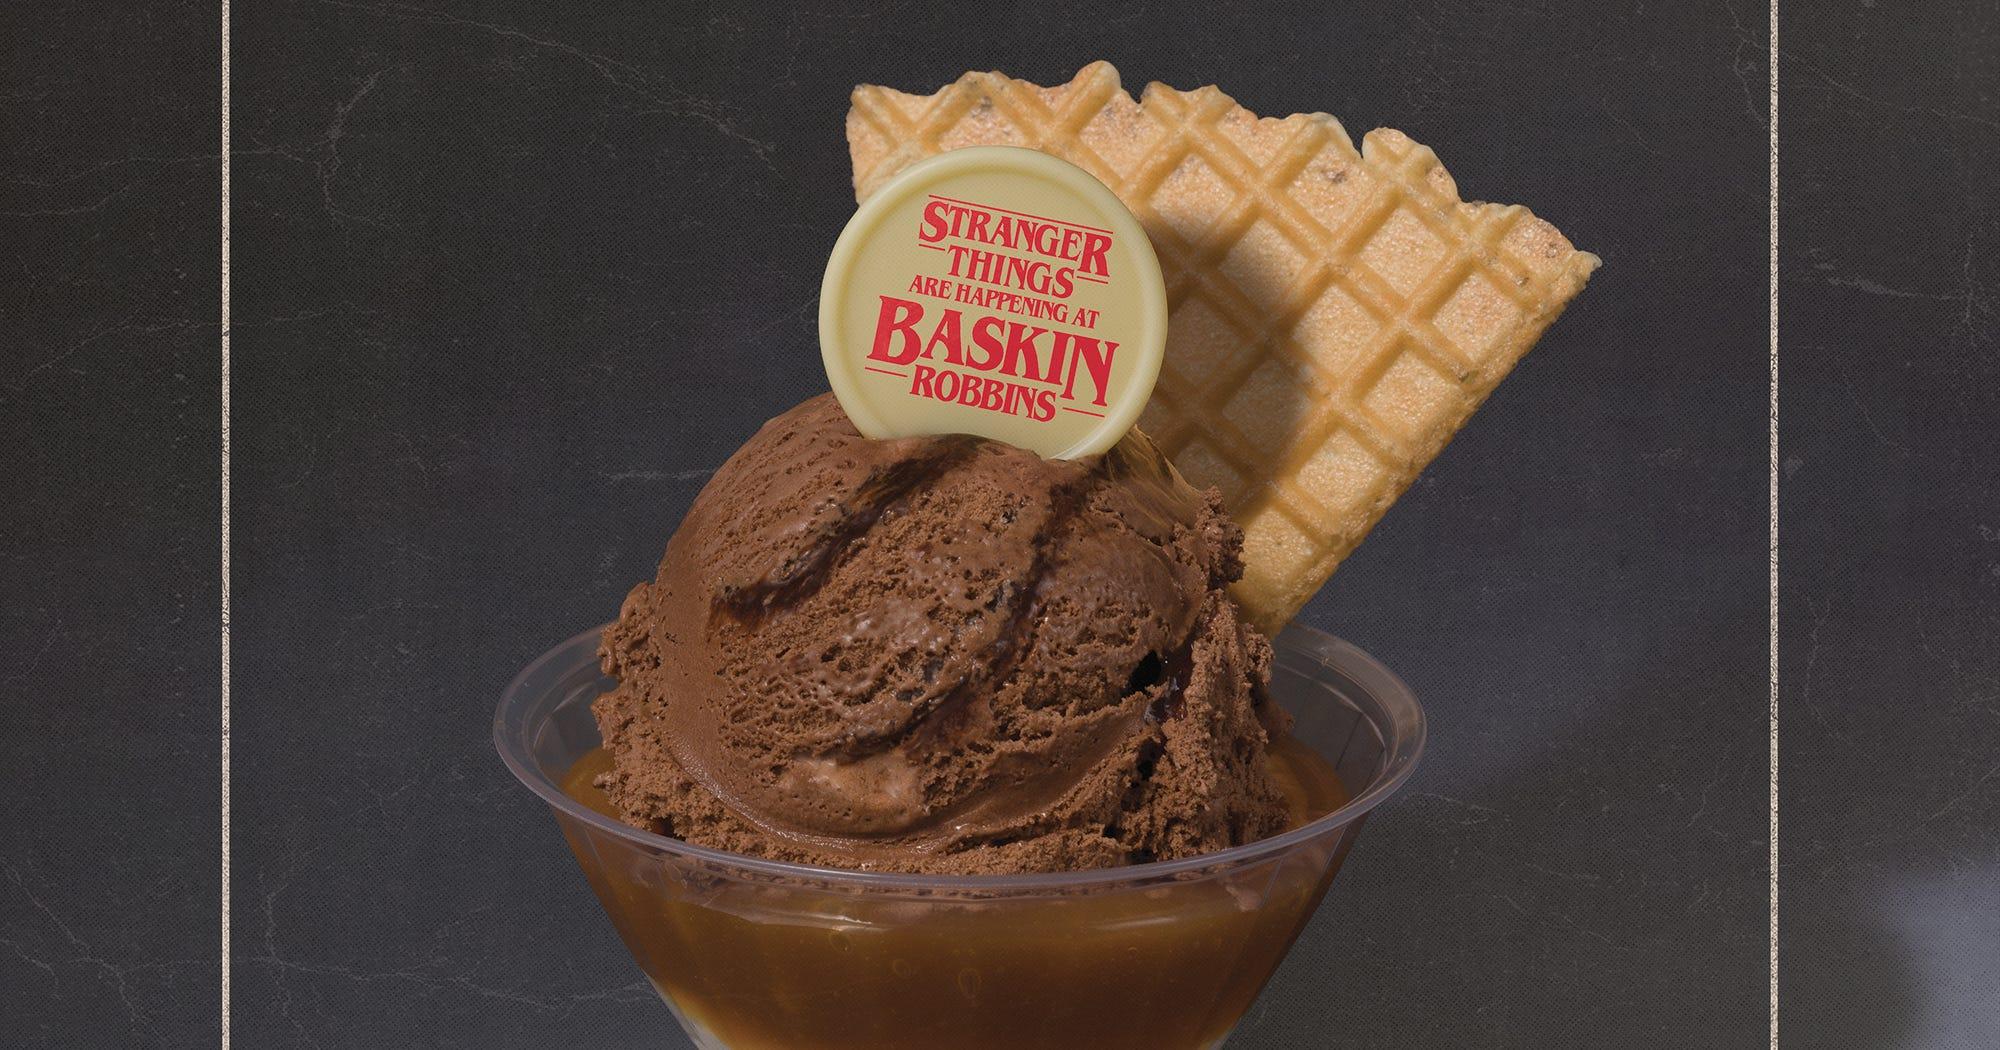 Netflix Amp Baskin Robbins Make Stranger Things Ice Cream